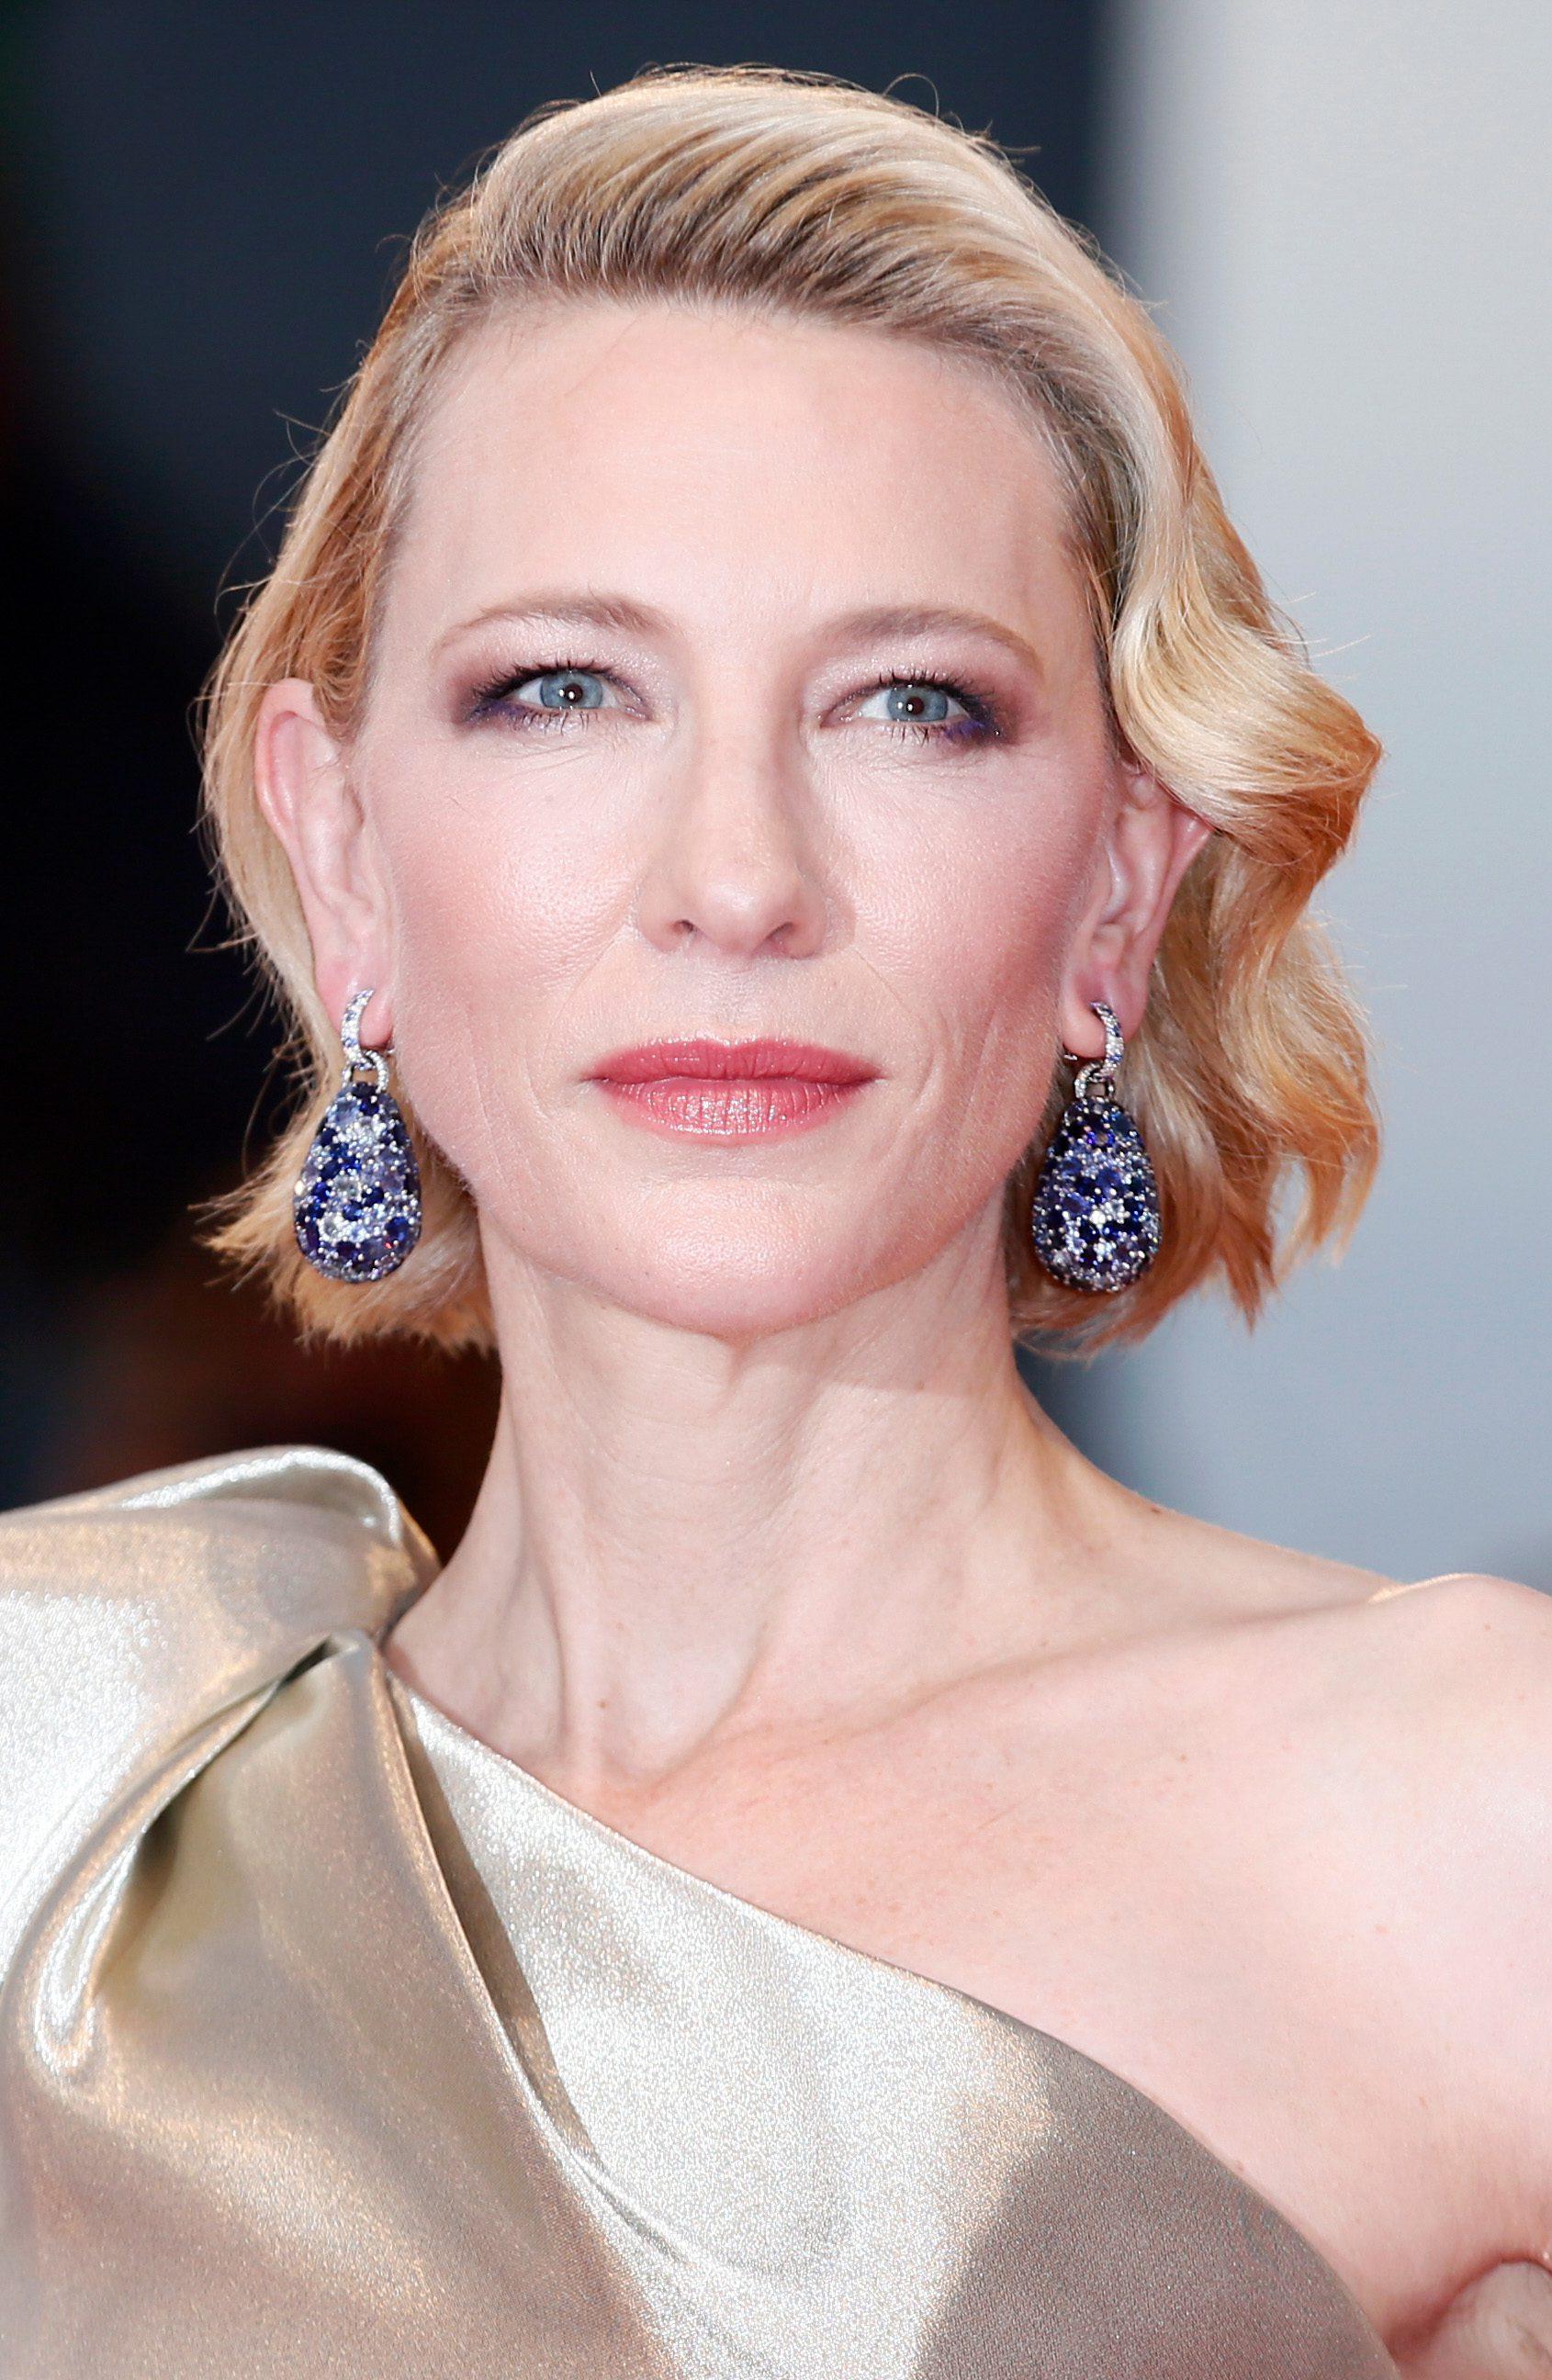 Cate Blanchett's Sleek Waves